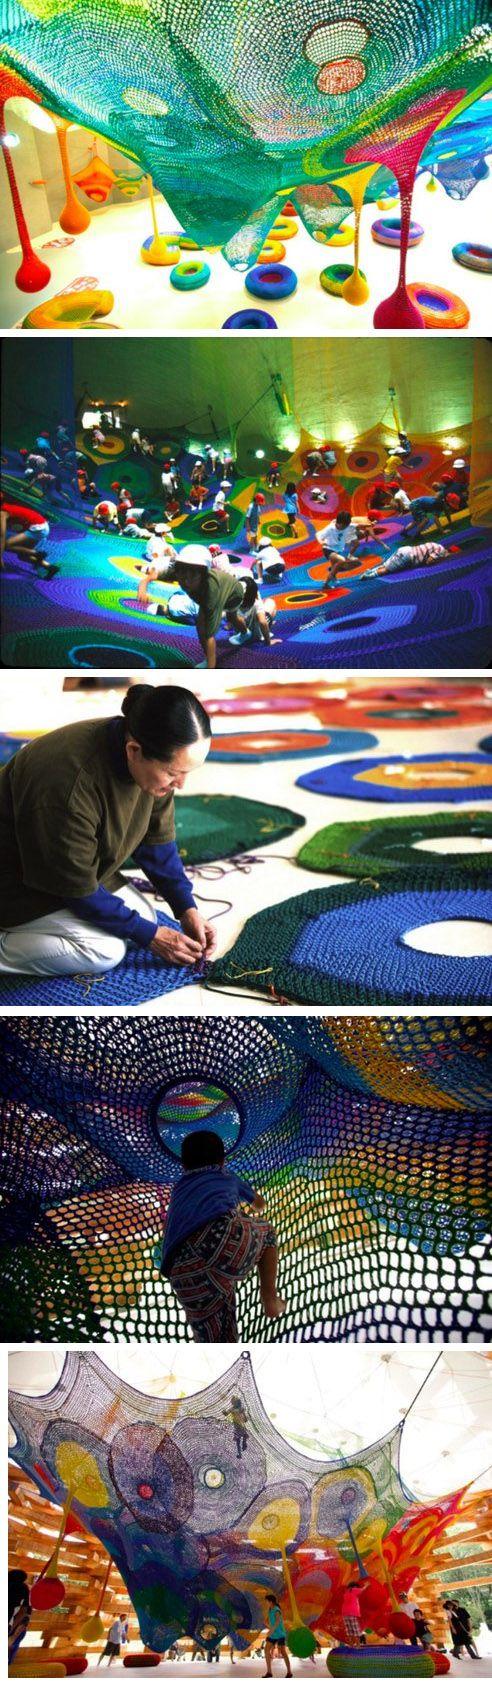 Japanese-born fiber artist Toshiko Horiuchi MacAdam's crocheted fabulous playgrounds for children ( http://netplayworks.com/NetPlayWorks/Projects/Projects.html ). Genius